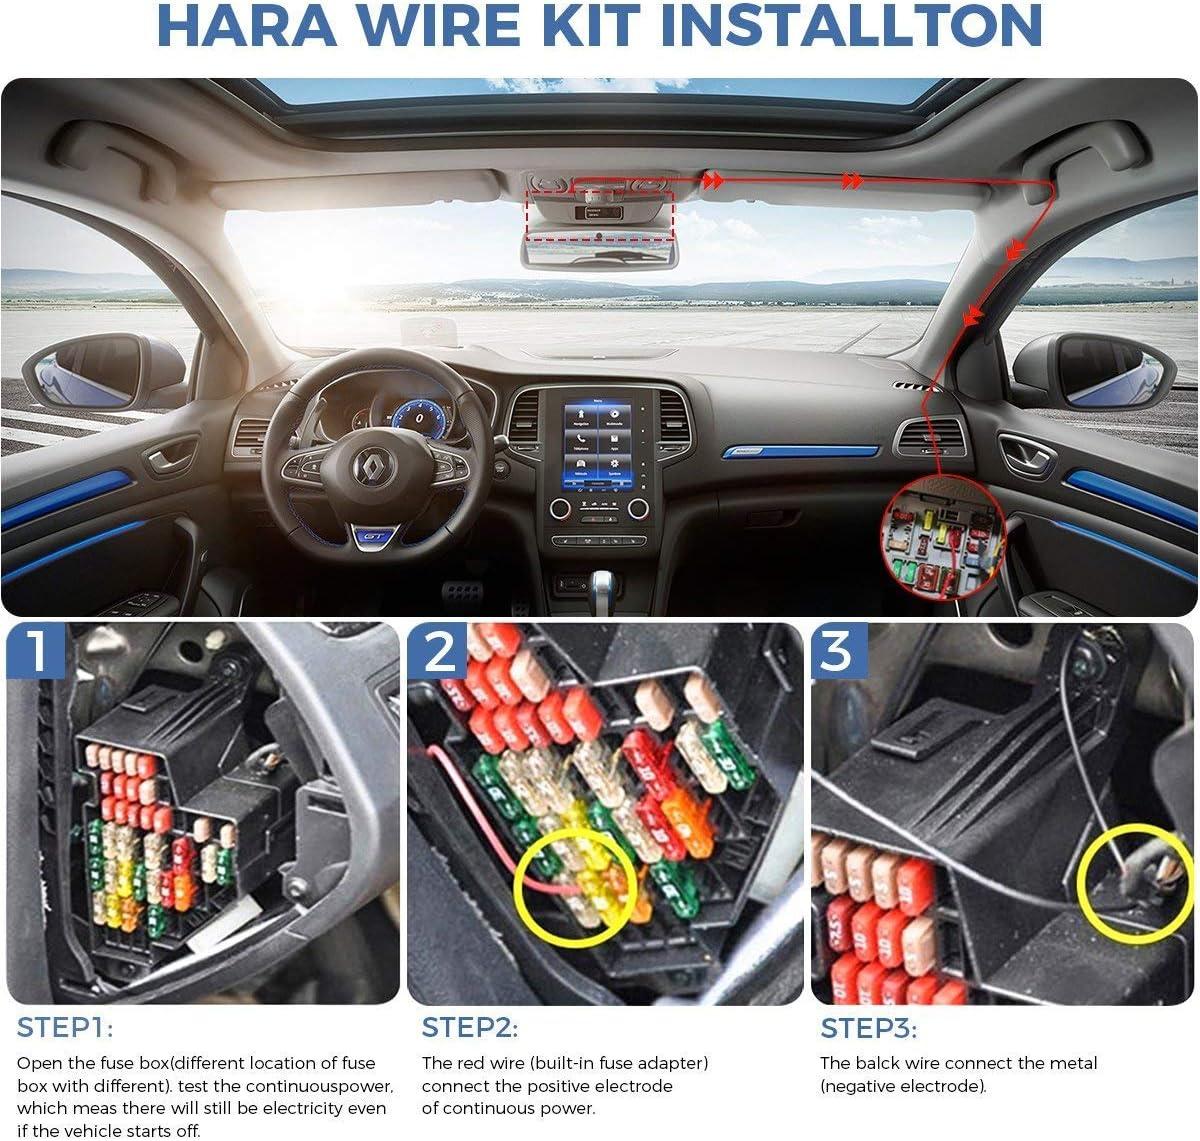 for Garmin 010-12530-03 Power Cord,for Garmin Dash Cam 45 55 65W 46 56 66W and Garmin Dash Cam Mini Power Cable 010-12530-01 Dash Cam Hardwire Kit